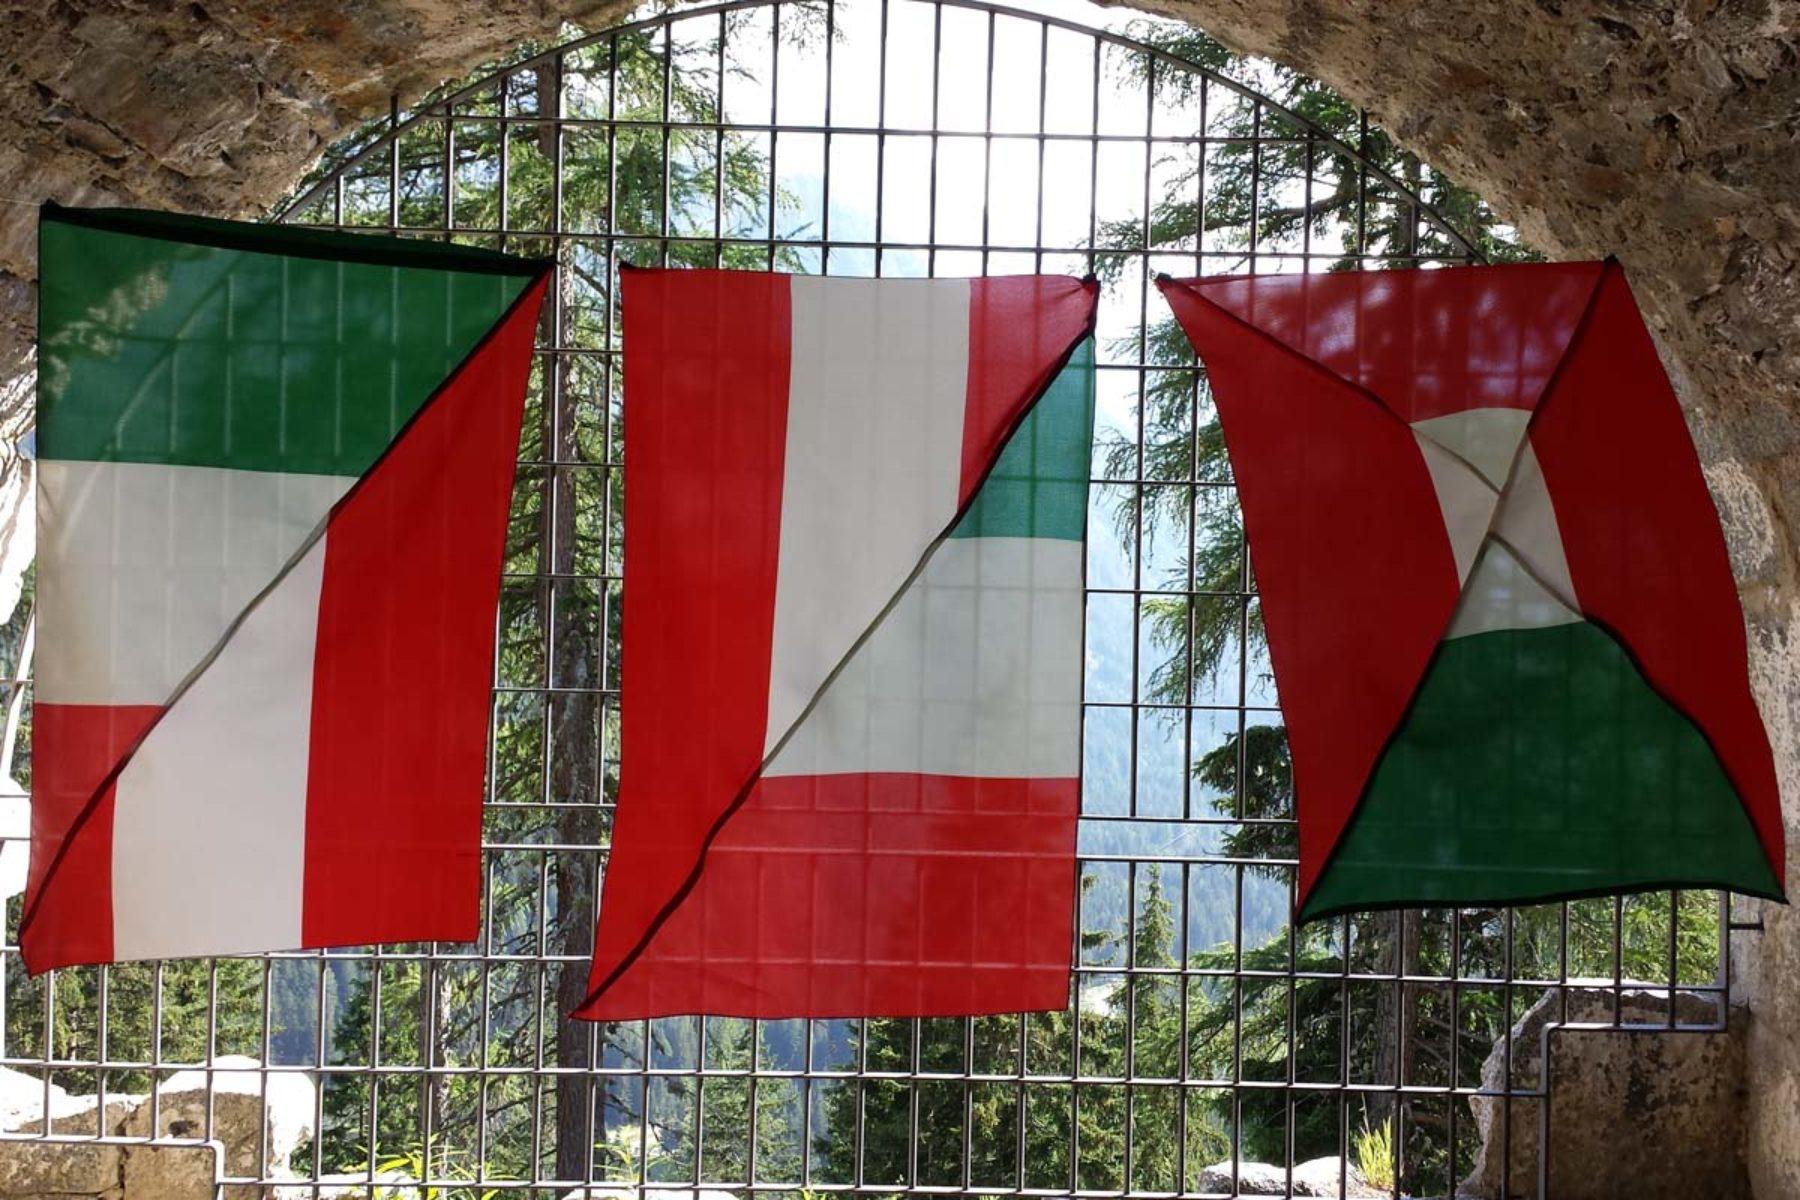 F. Lanaro, IT_A, 2013, sewn flags, installation view, 3